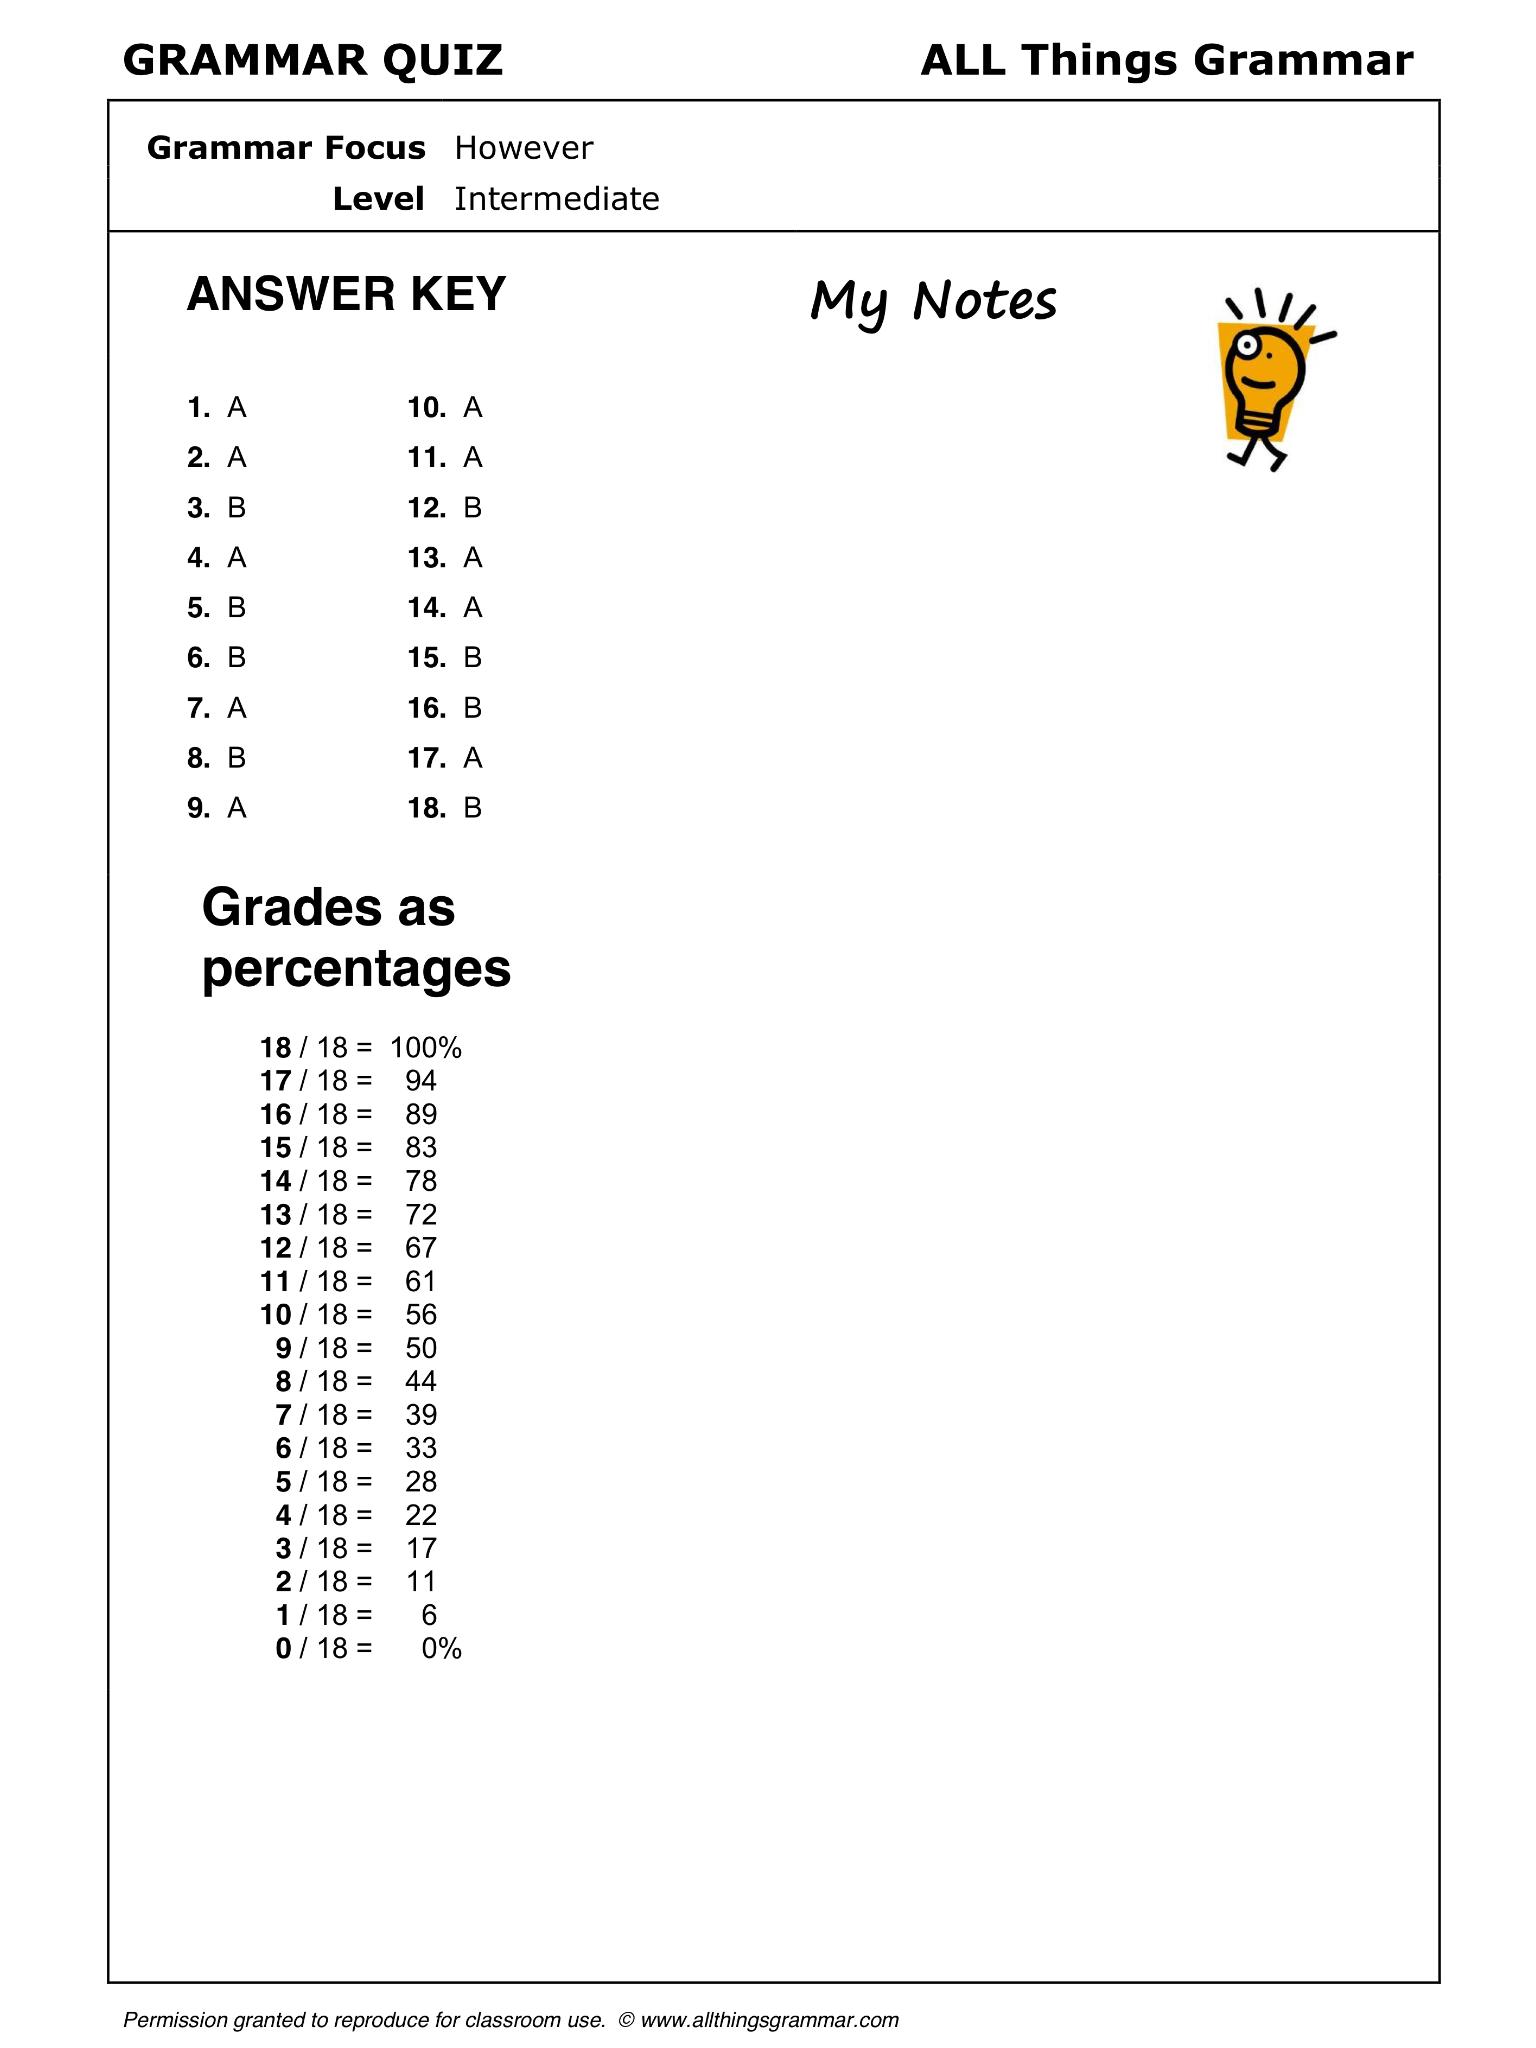 English Grammar However Www Allthingsgrammar Com However Html Grammar Quiz English Grammar Grammar Worksheets [ 2048 x 1536 Pixel ]